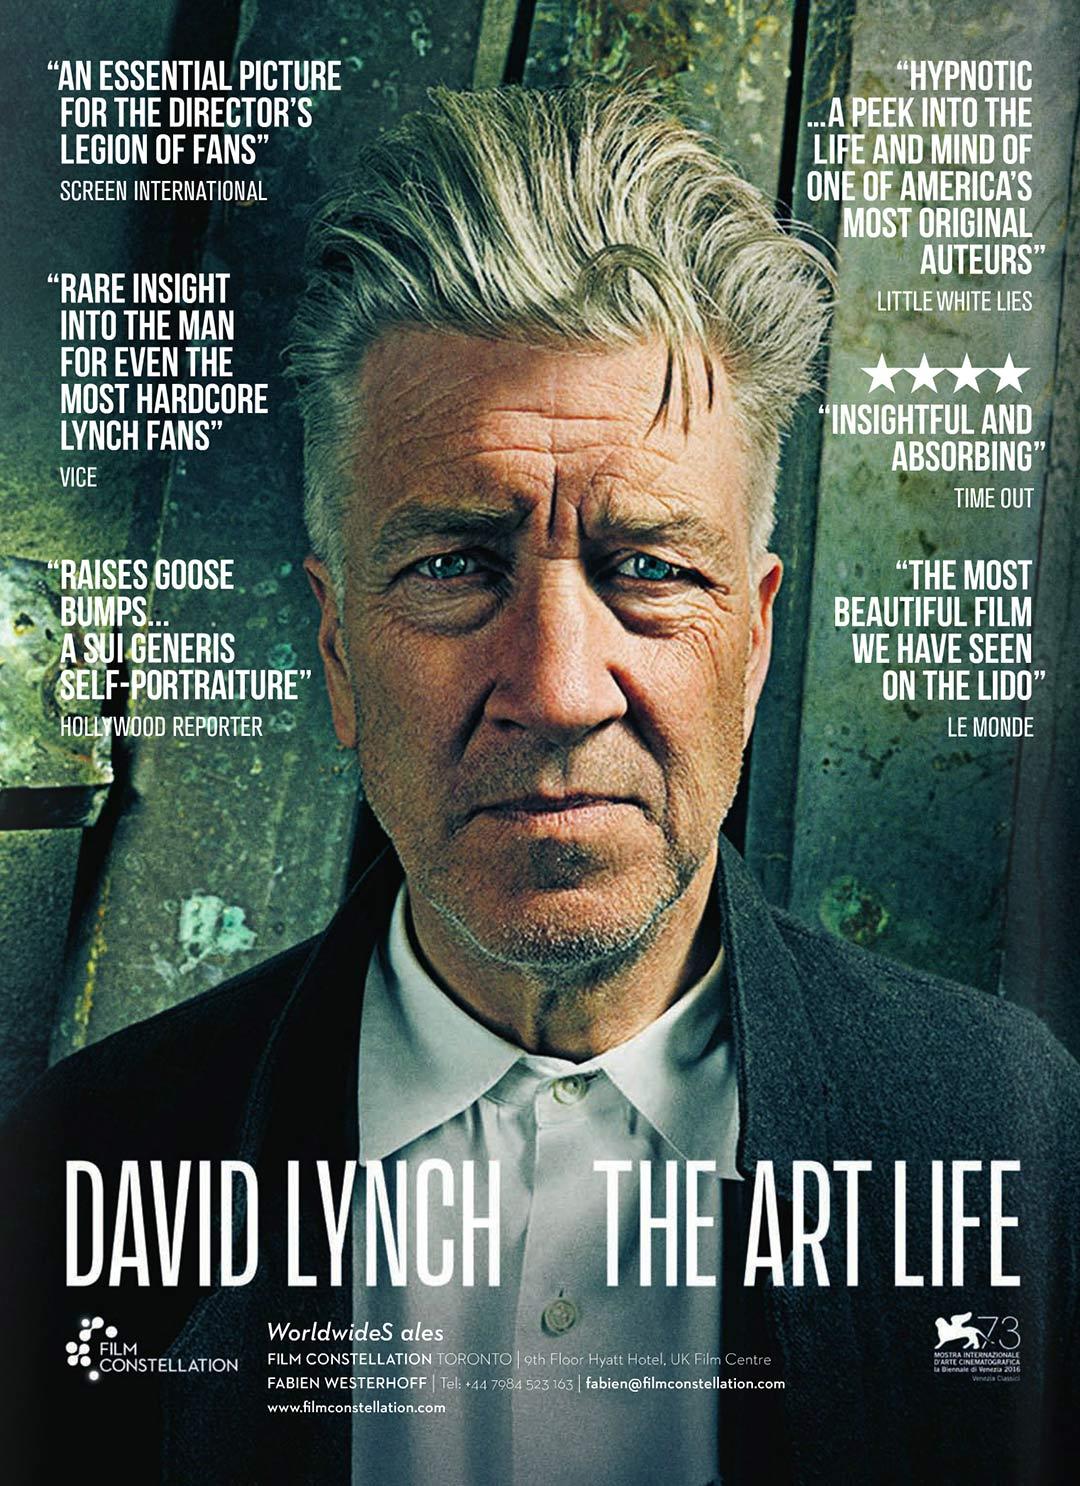 David Lynch - The Art Life Poster #1